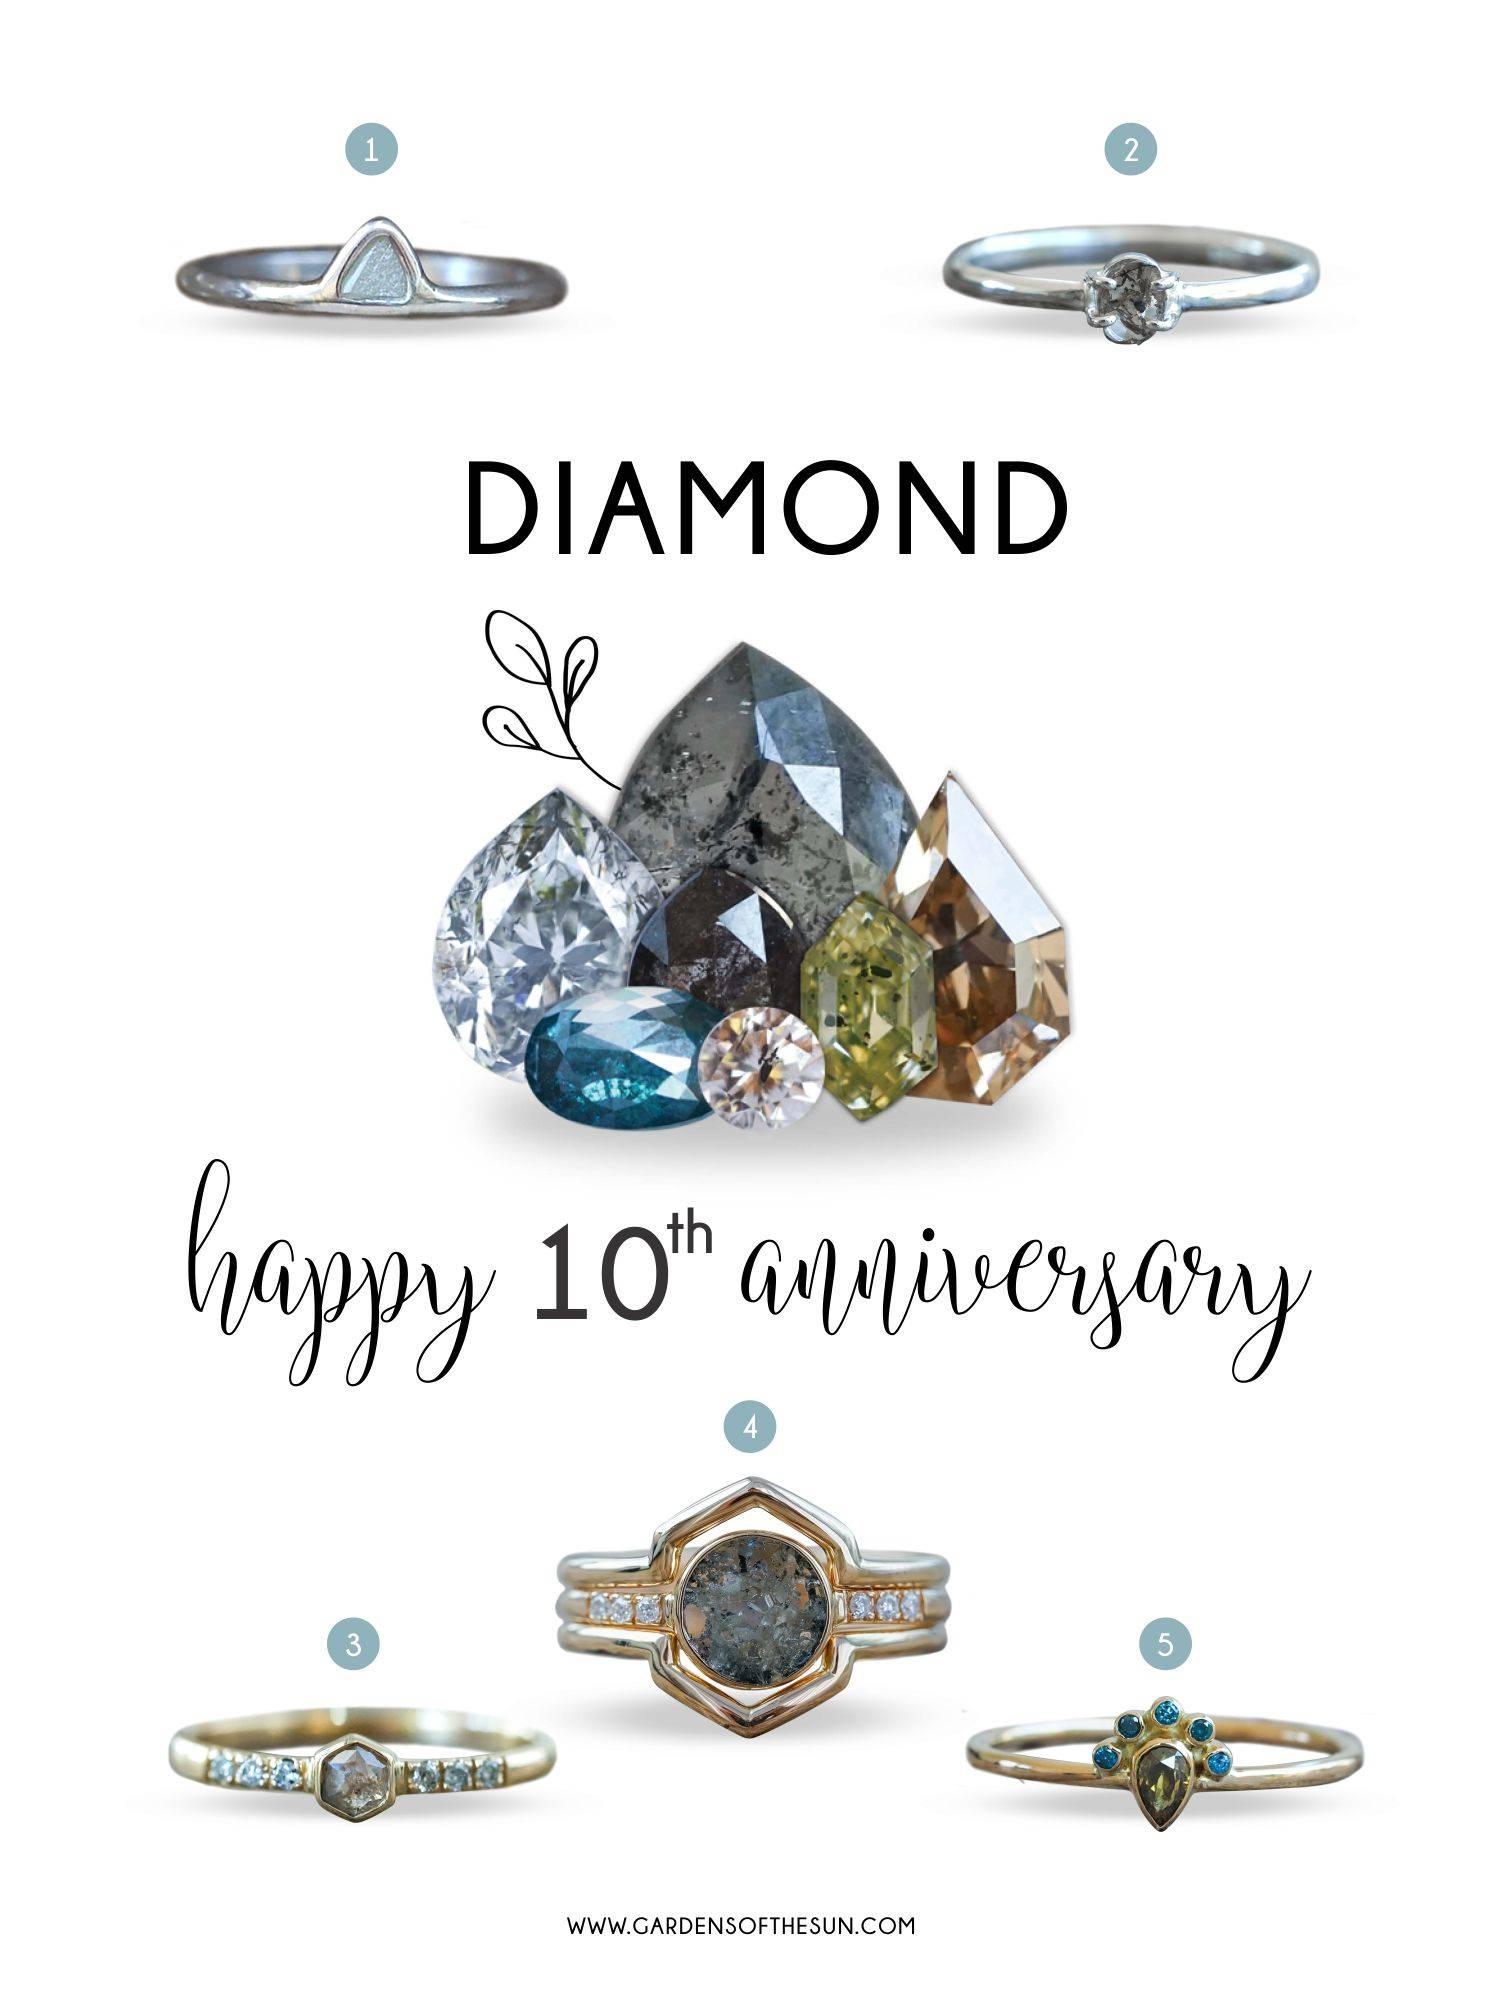 Ethical diamond rings